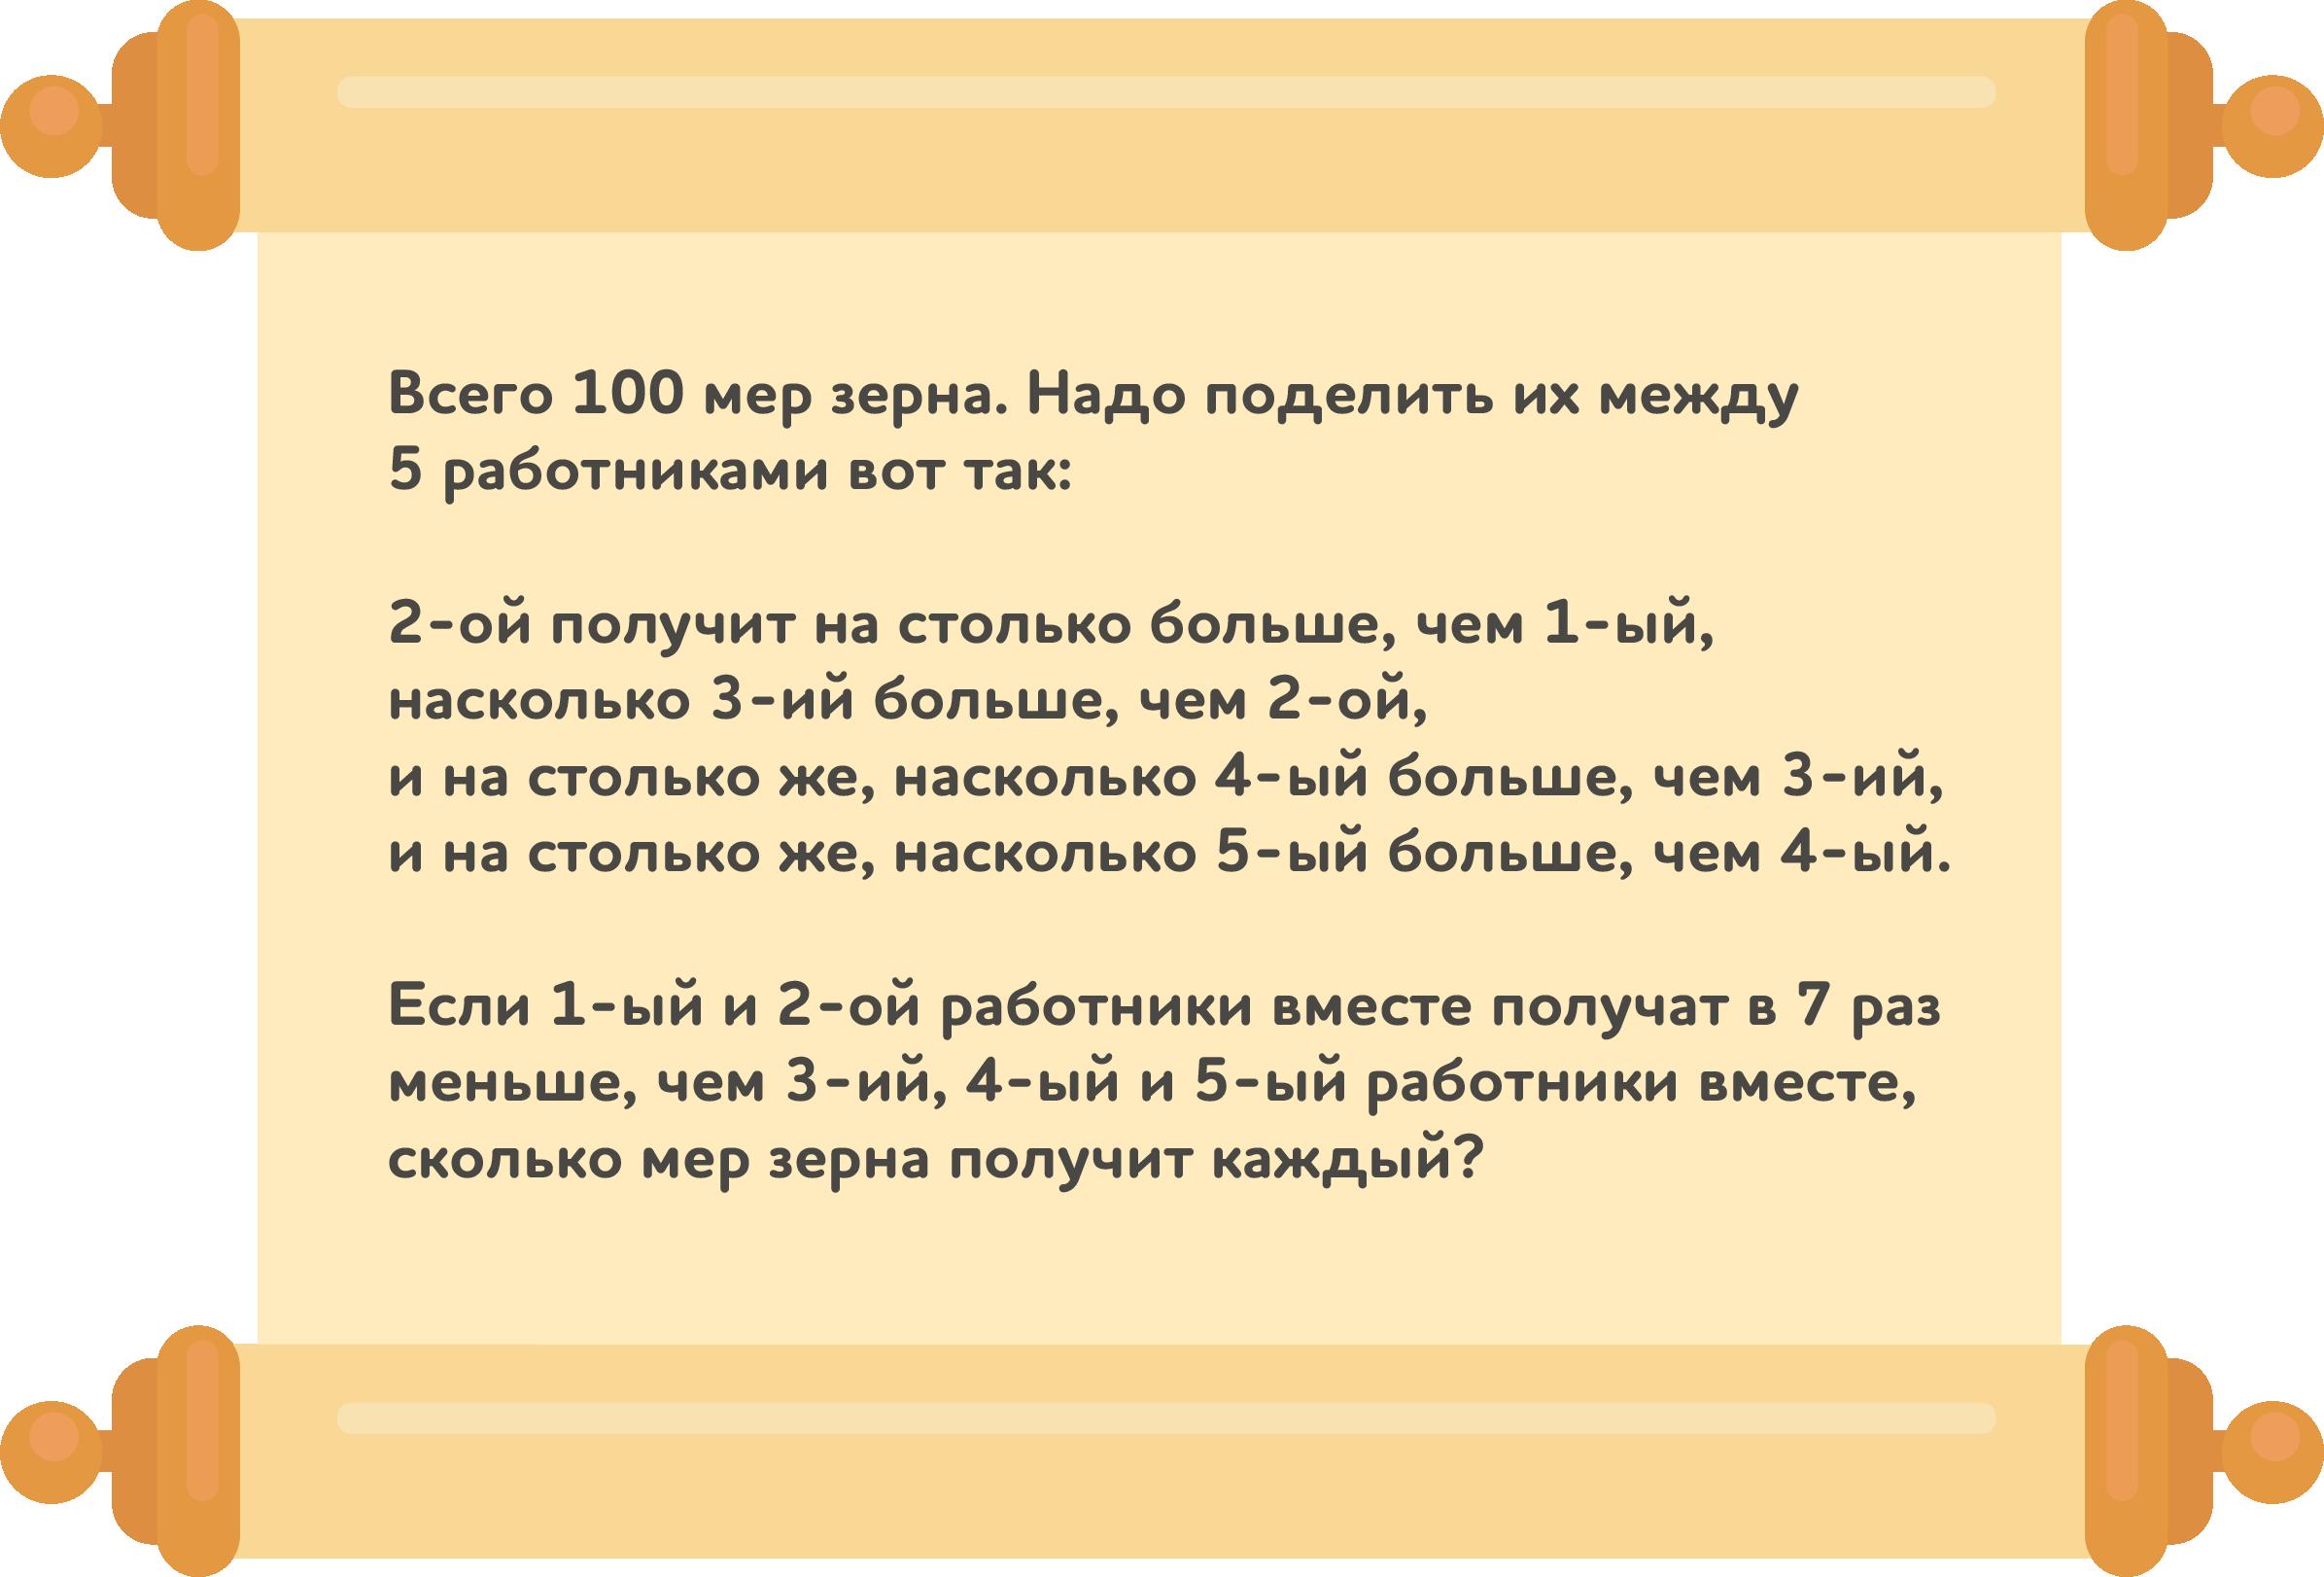 Папирус Ахмеса — иллюстрация с условиями задачи